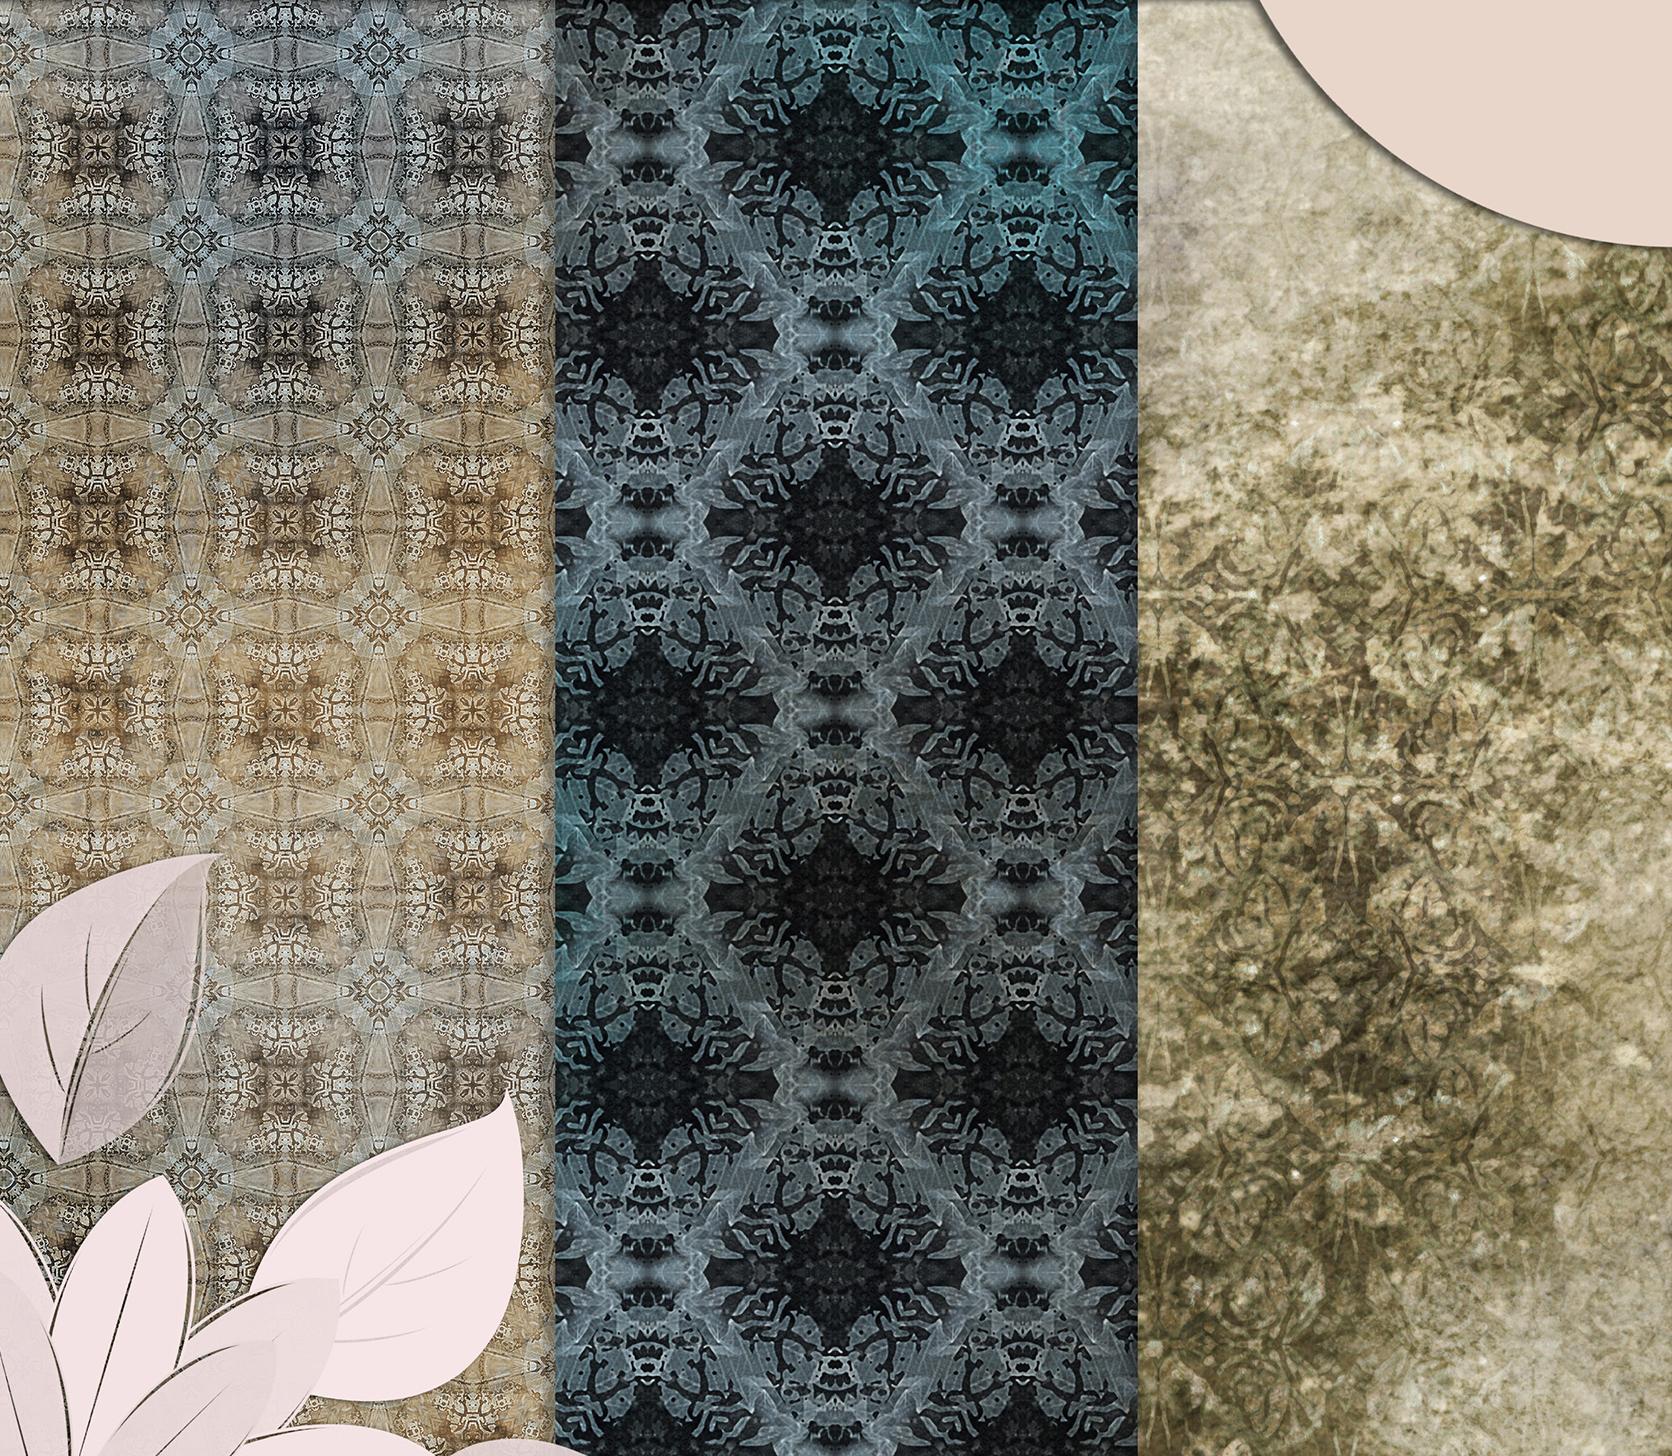 Beige-Blue Old Shabby Digital Backgrounds example image 6